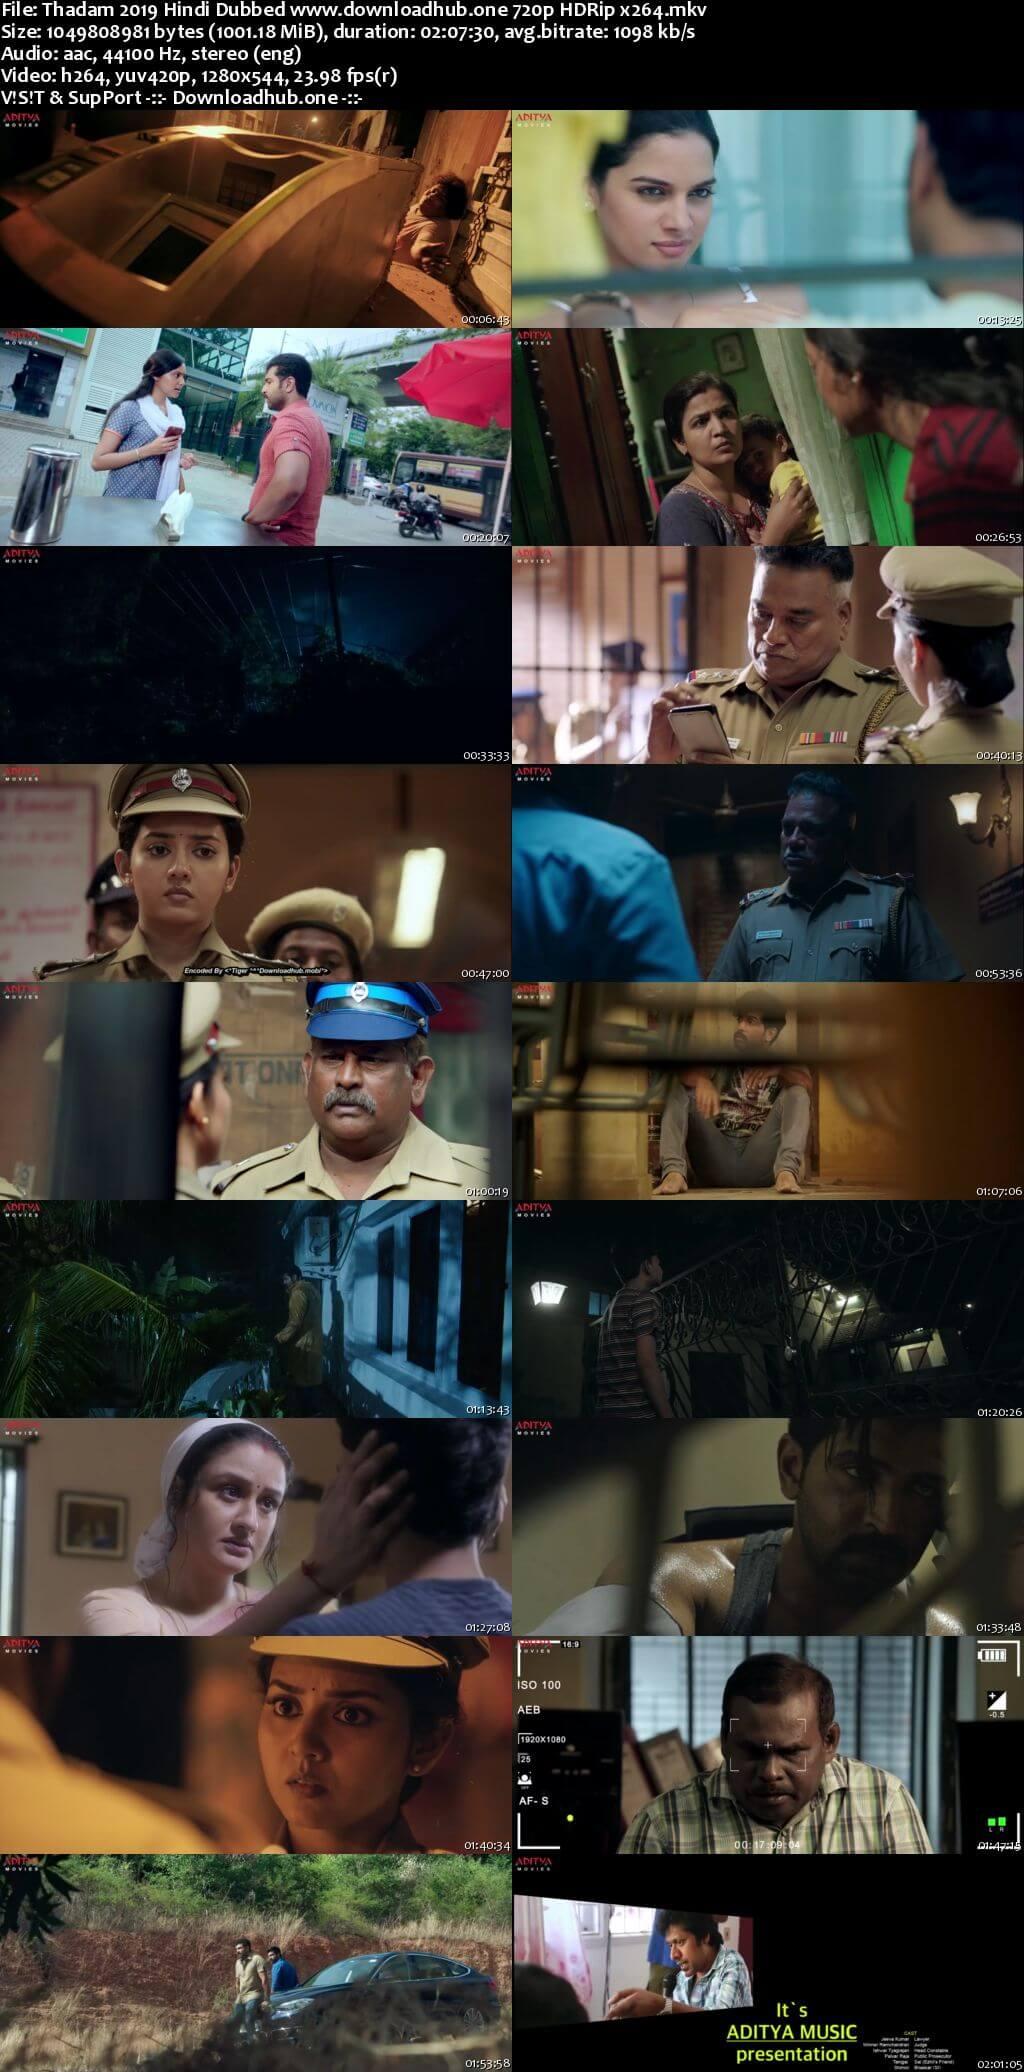 Thadam 2019 Hindi Dubbed 720p HDRip x264